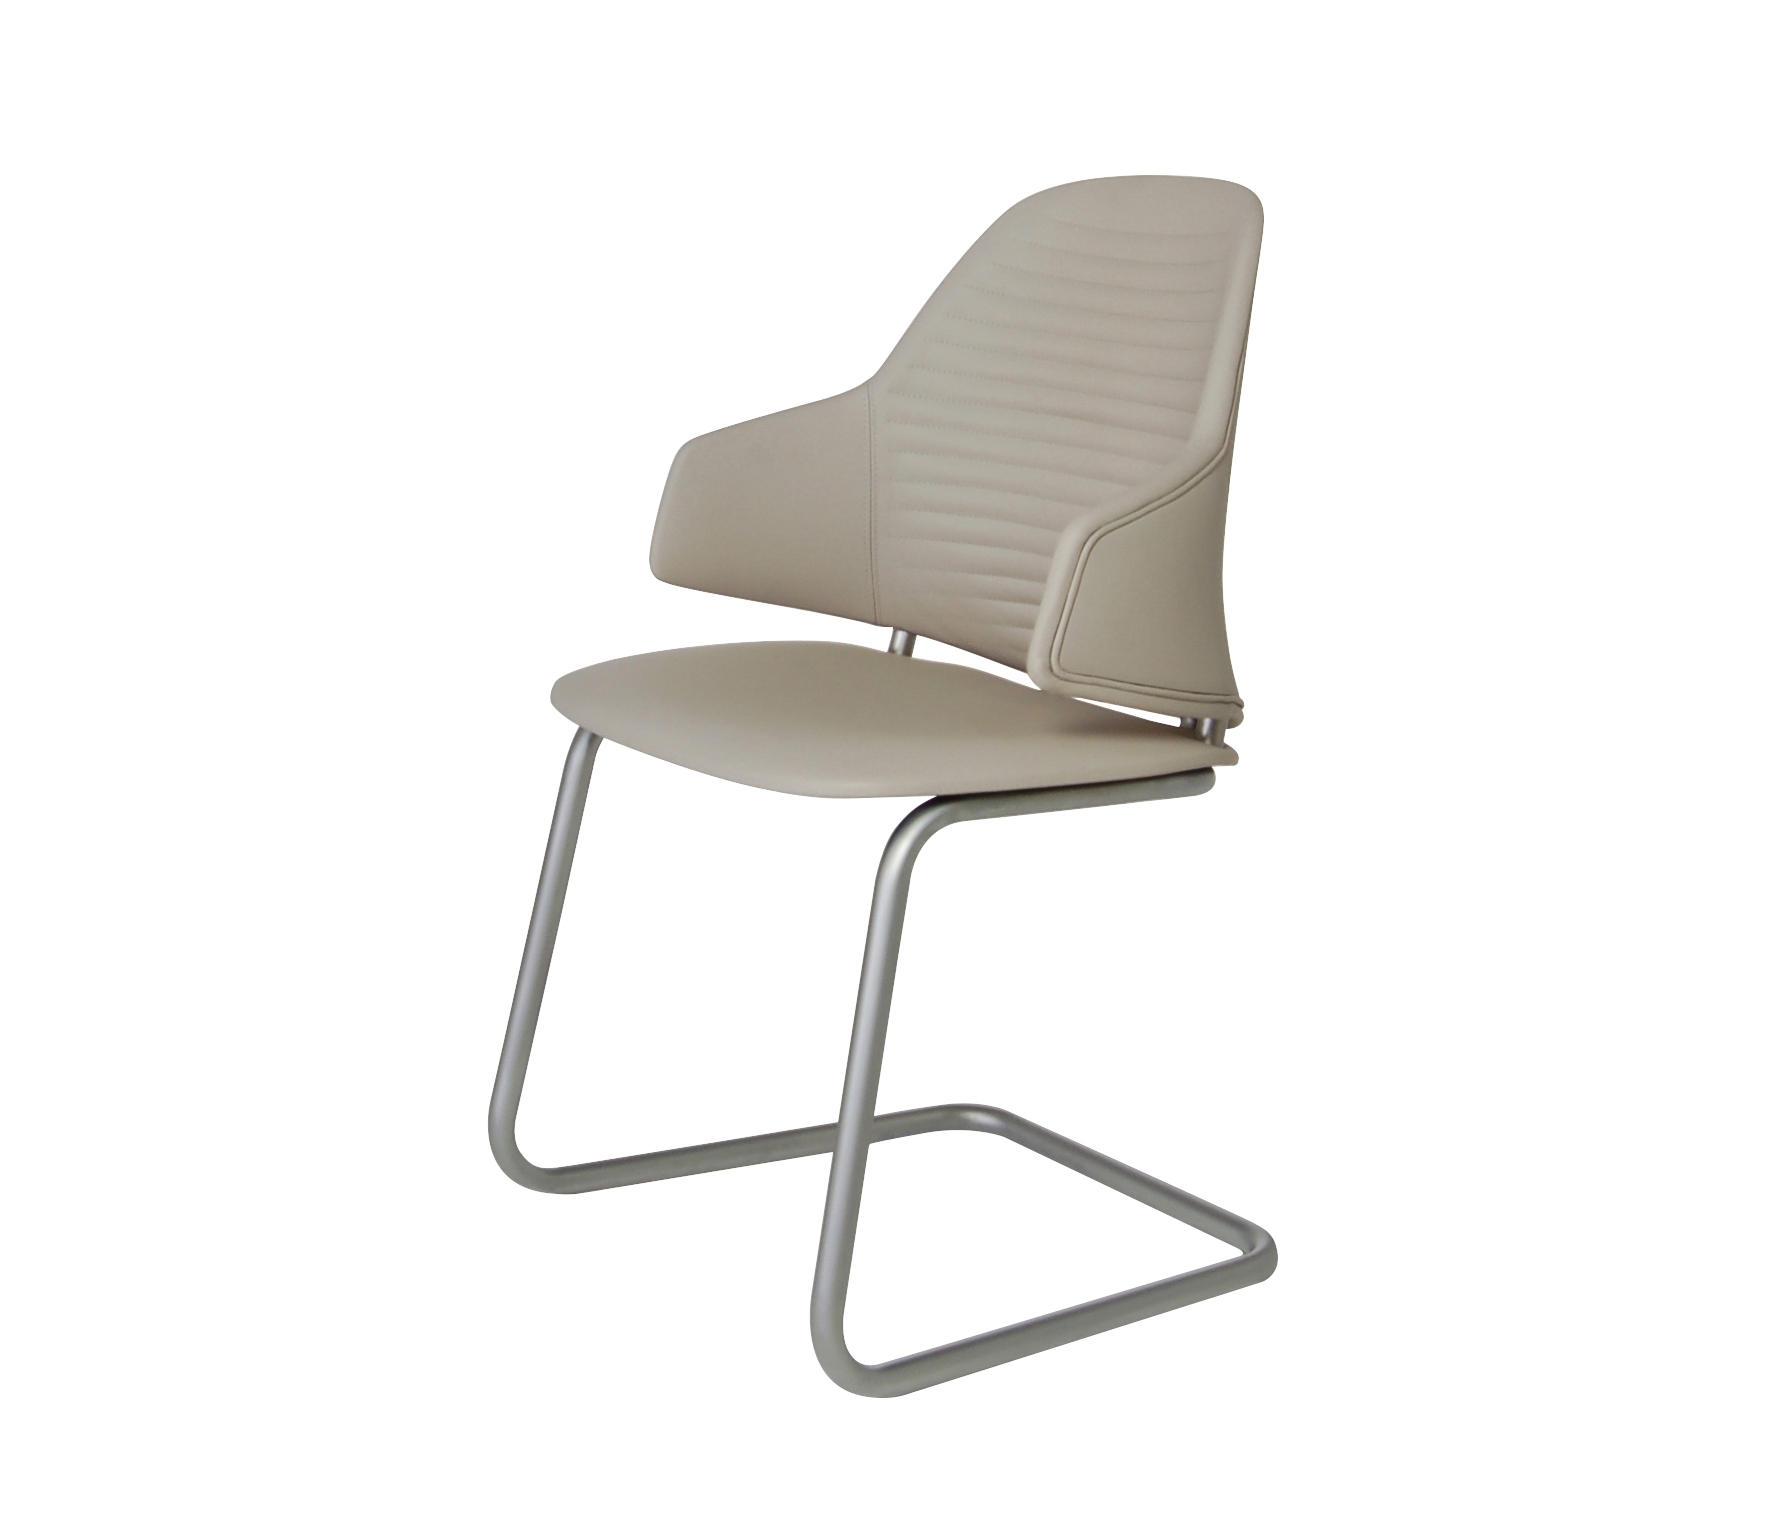 Architonic Regarding Vela Side Chairs (#3 of 20)